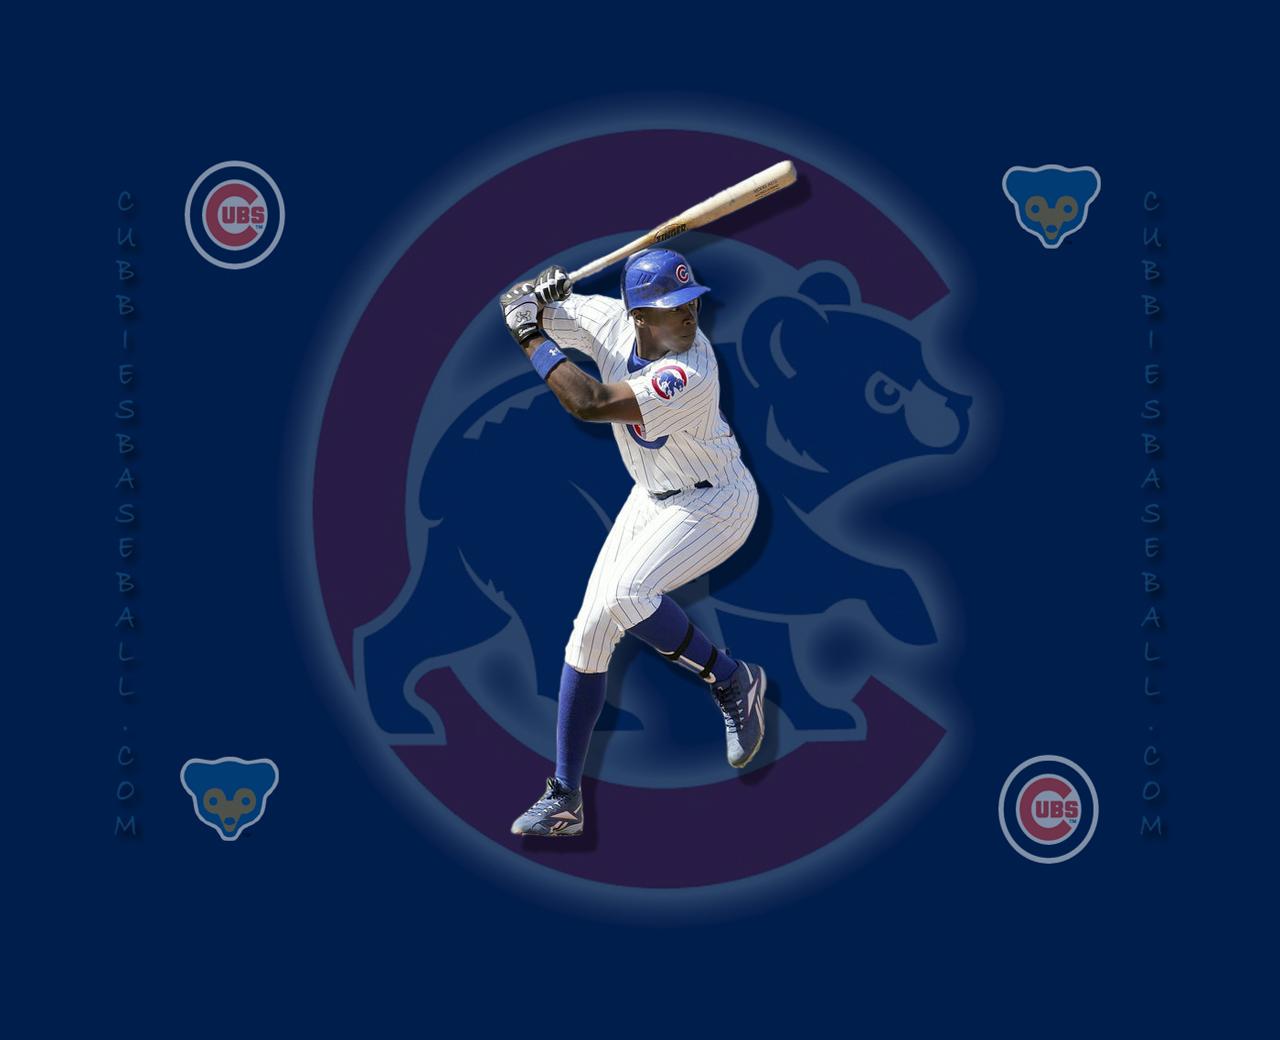 Access denied Cubbies Baseball   Chicago Cubs Merchandise Apparel 1280x1040